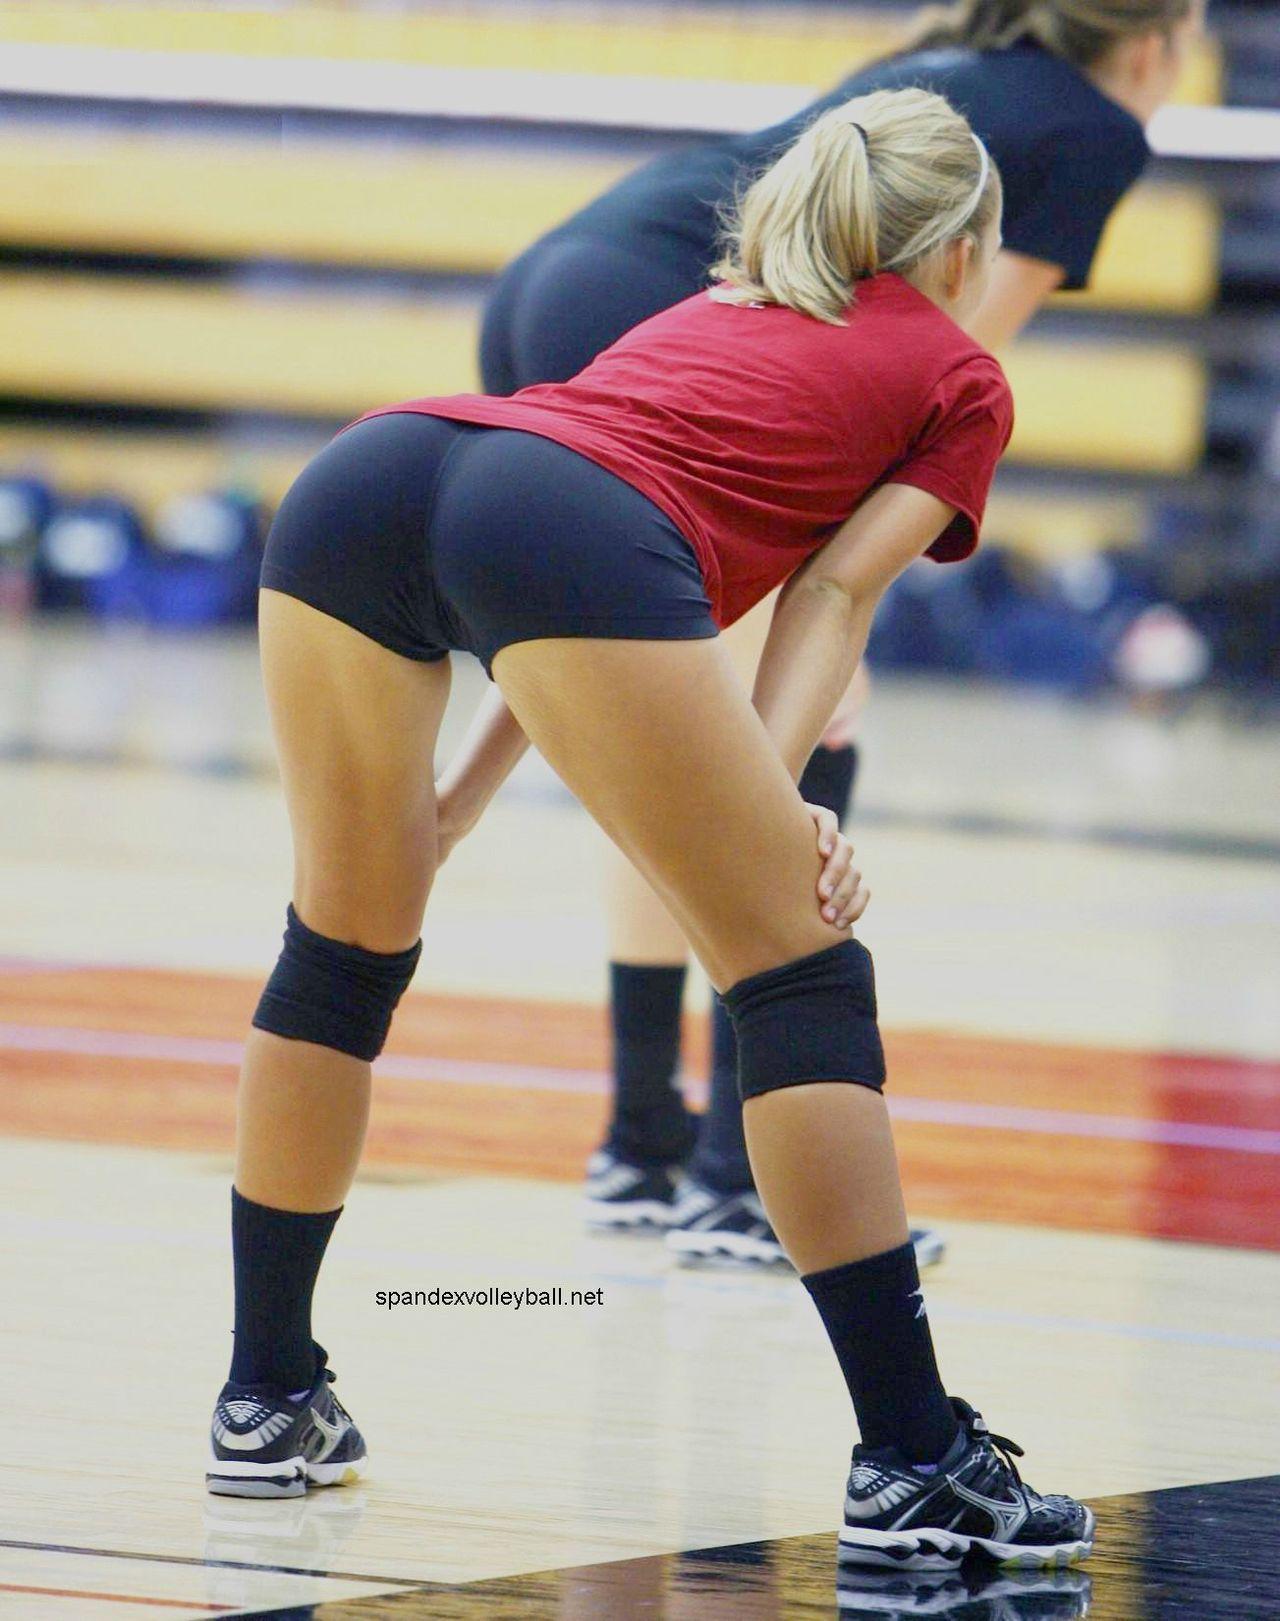 Obv Volleyball